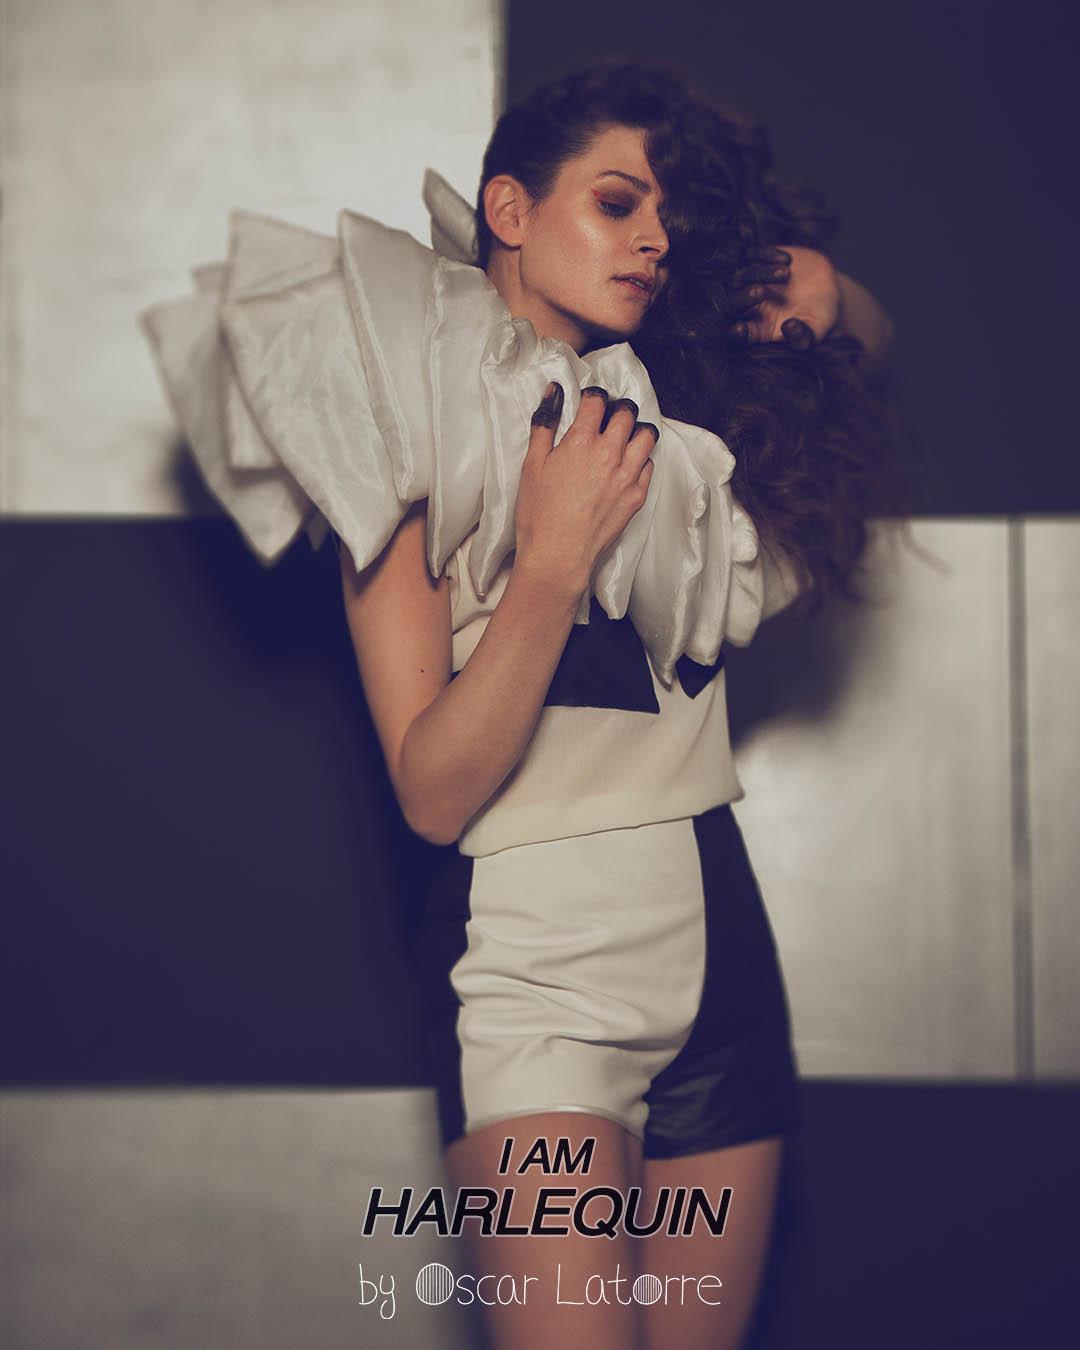 I Am Harlequin by Oscar Latorre